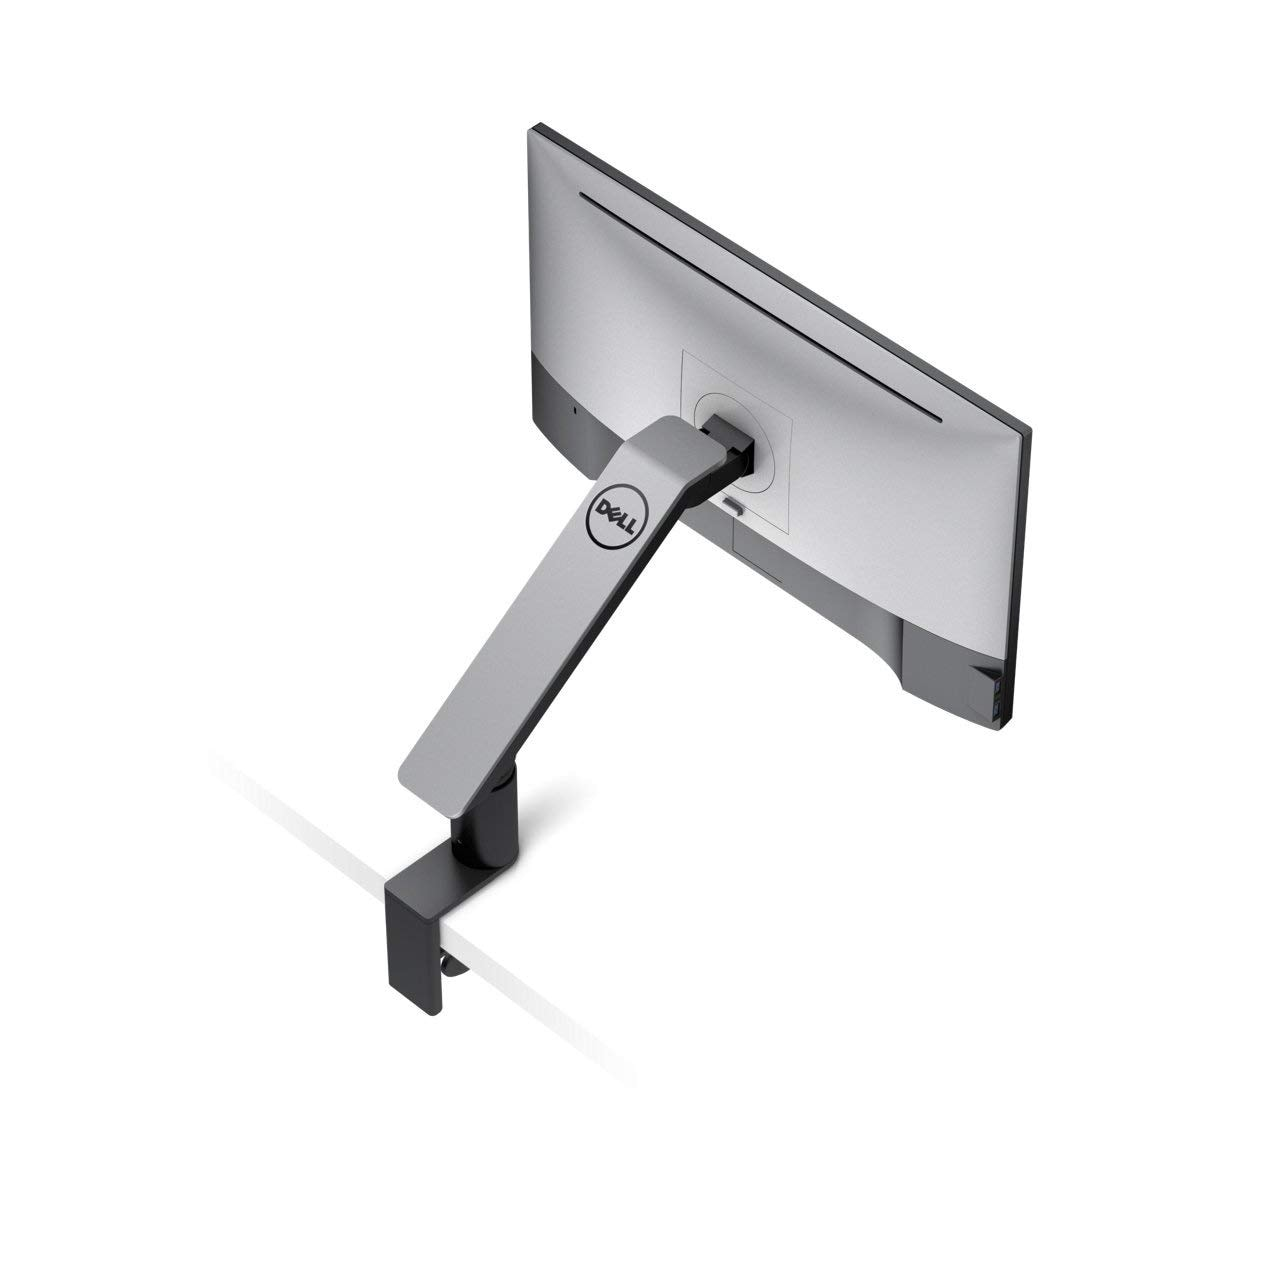 Dell U2417ha 24 Inch Ultrasharp Infinity Edge Monitor